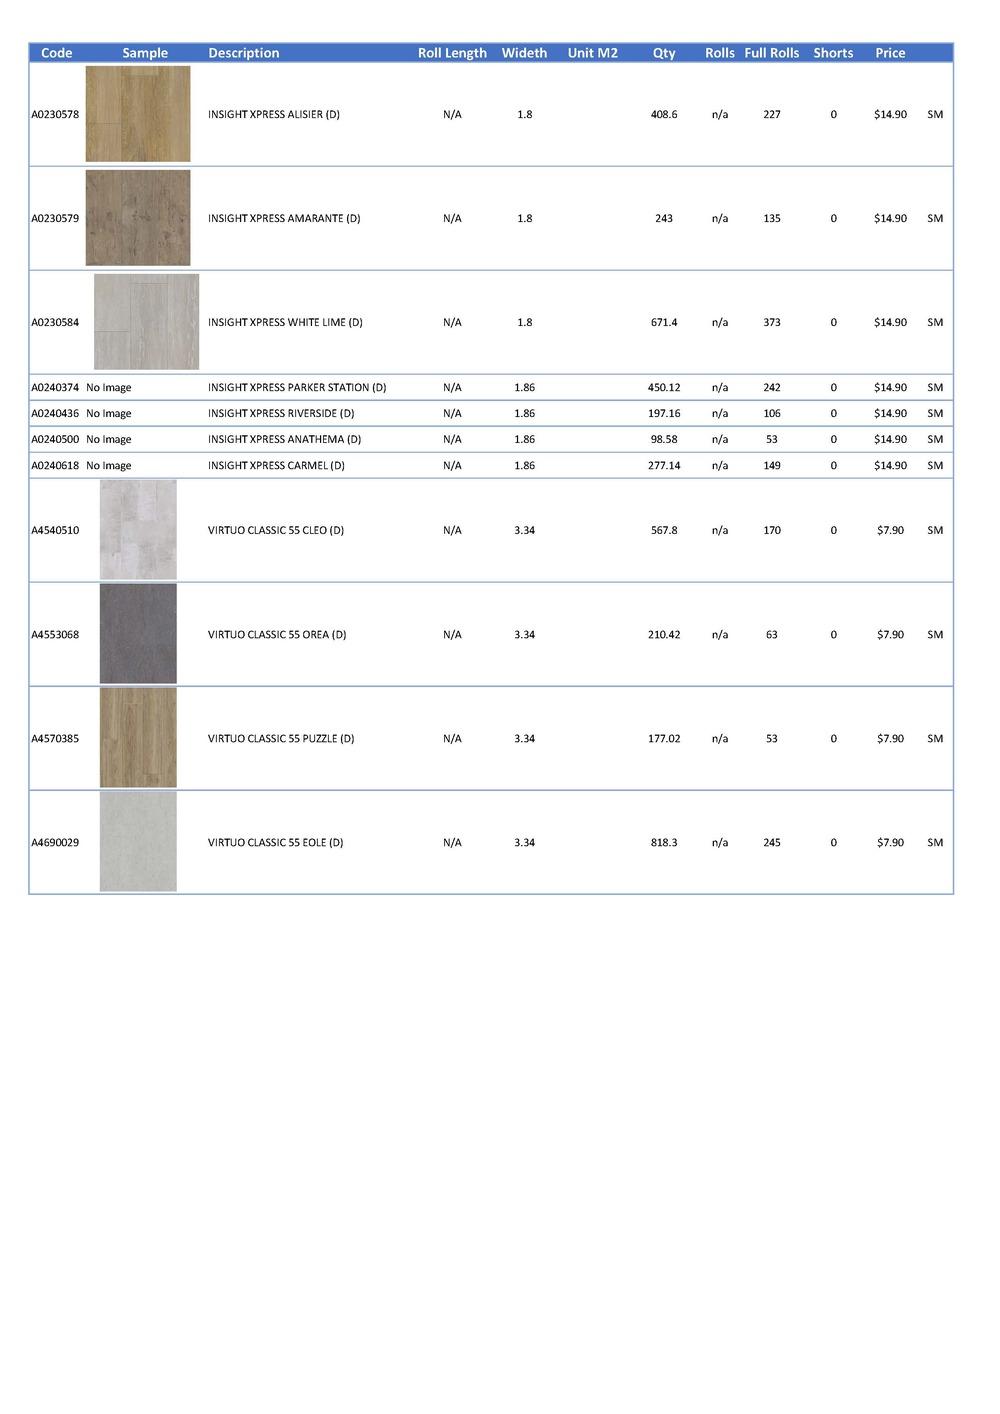 Q3 Price List Page 2